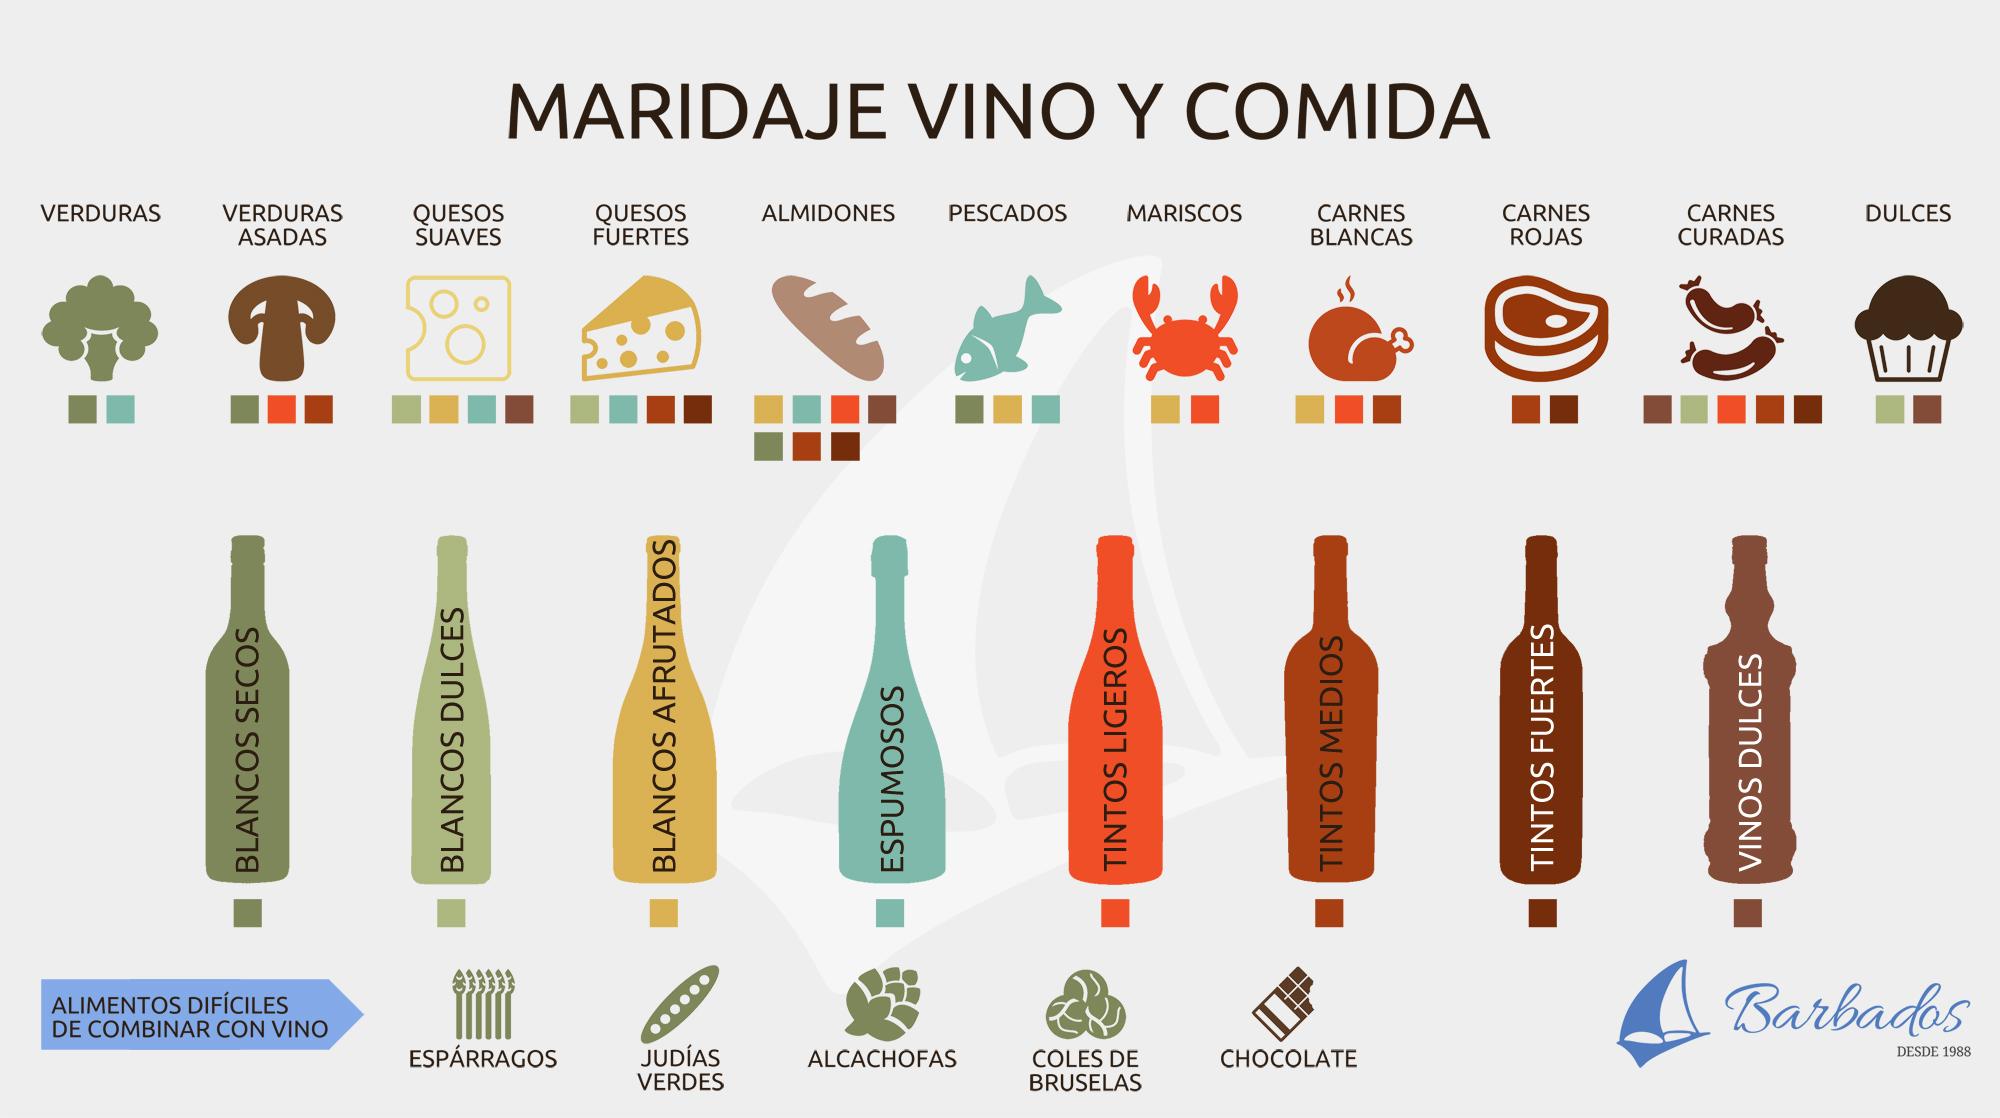 maridaje-vino-comida-barbados-restaurante-cocina-mercado-valencia.jpg